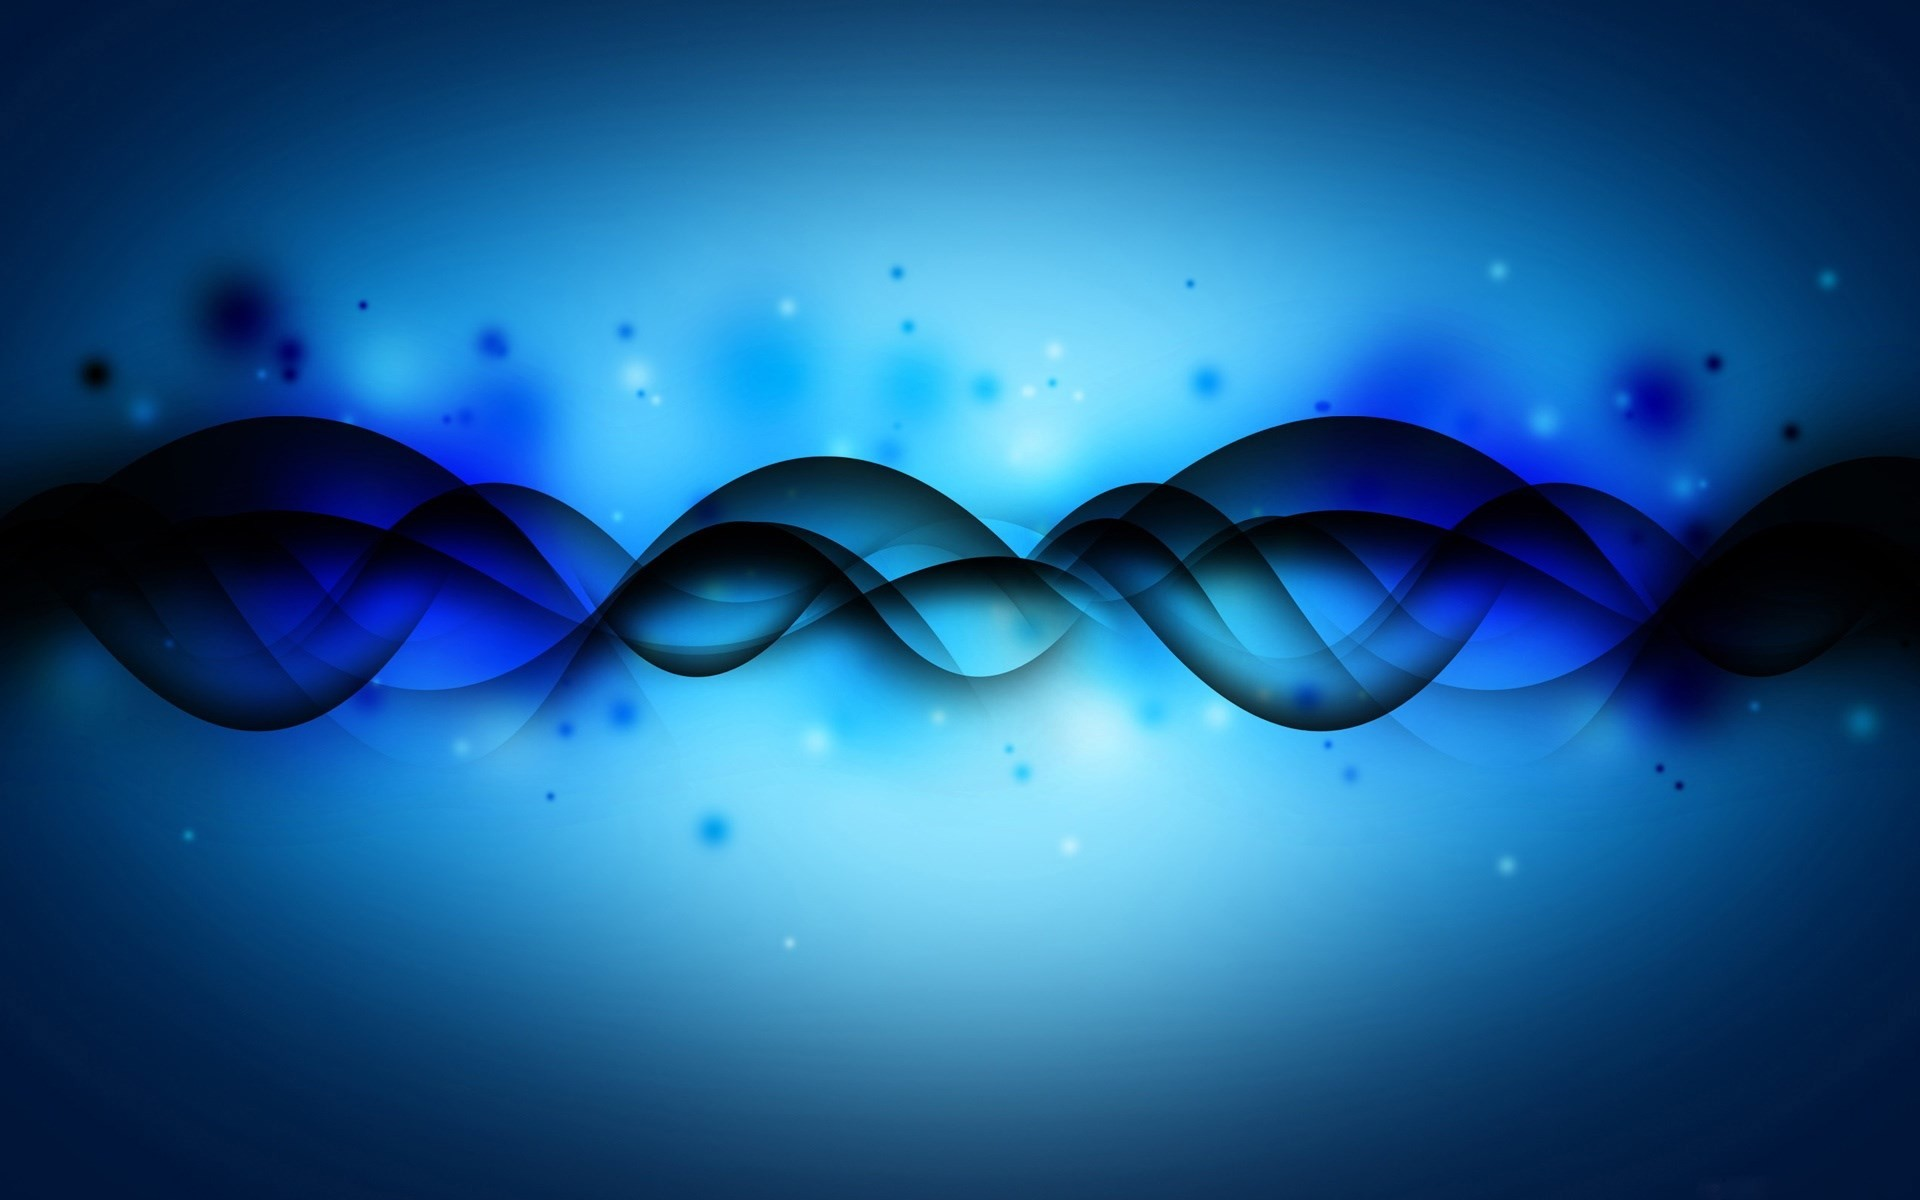 sound waves wallpaper …